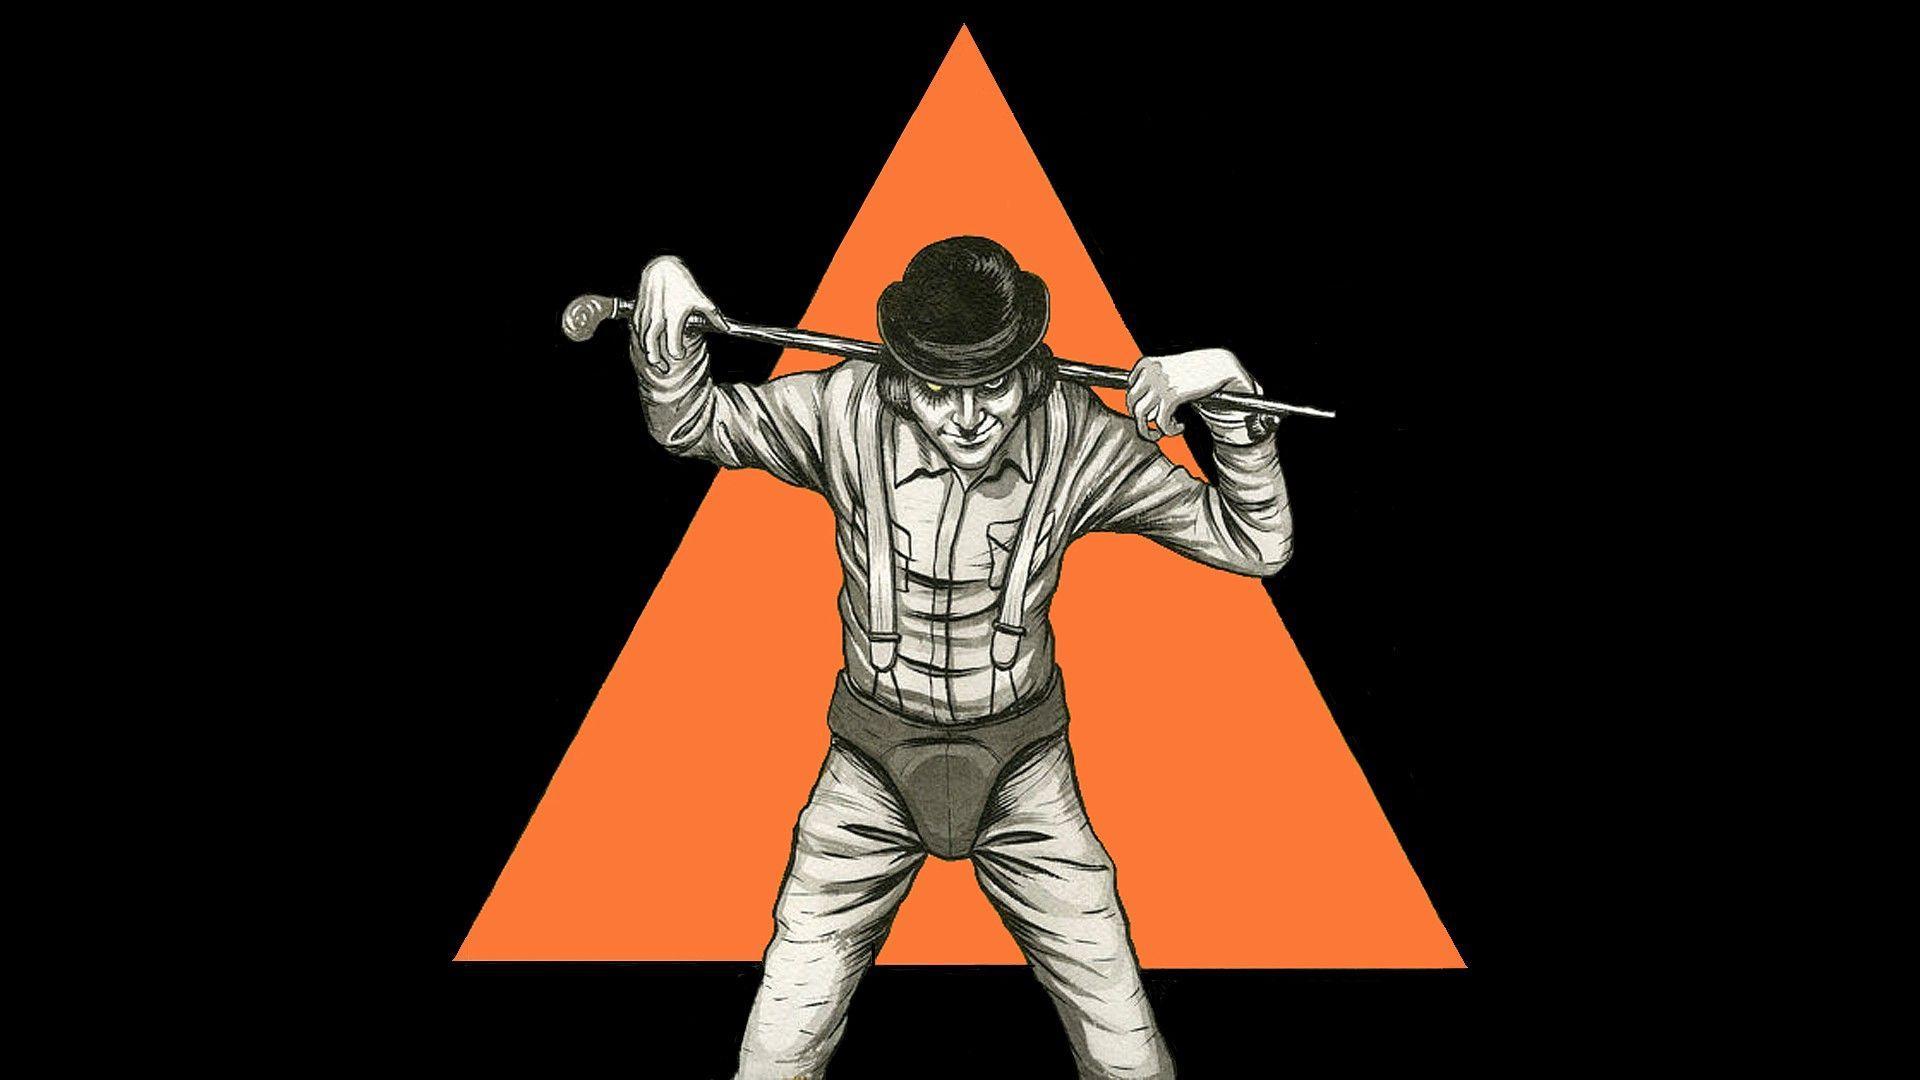 A Clockwork Orange Wallpapers - Top Free A Clockwork Orange Backgrounds - WallpaperAccess